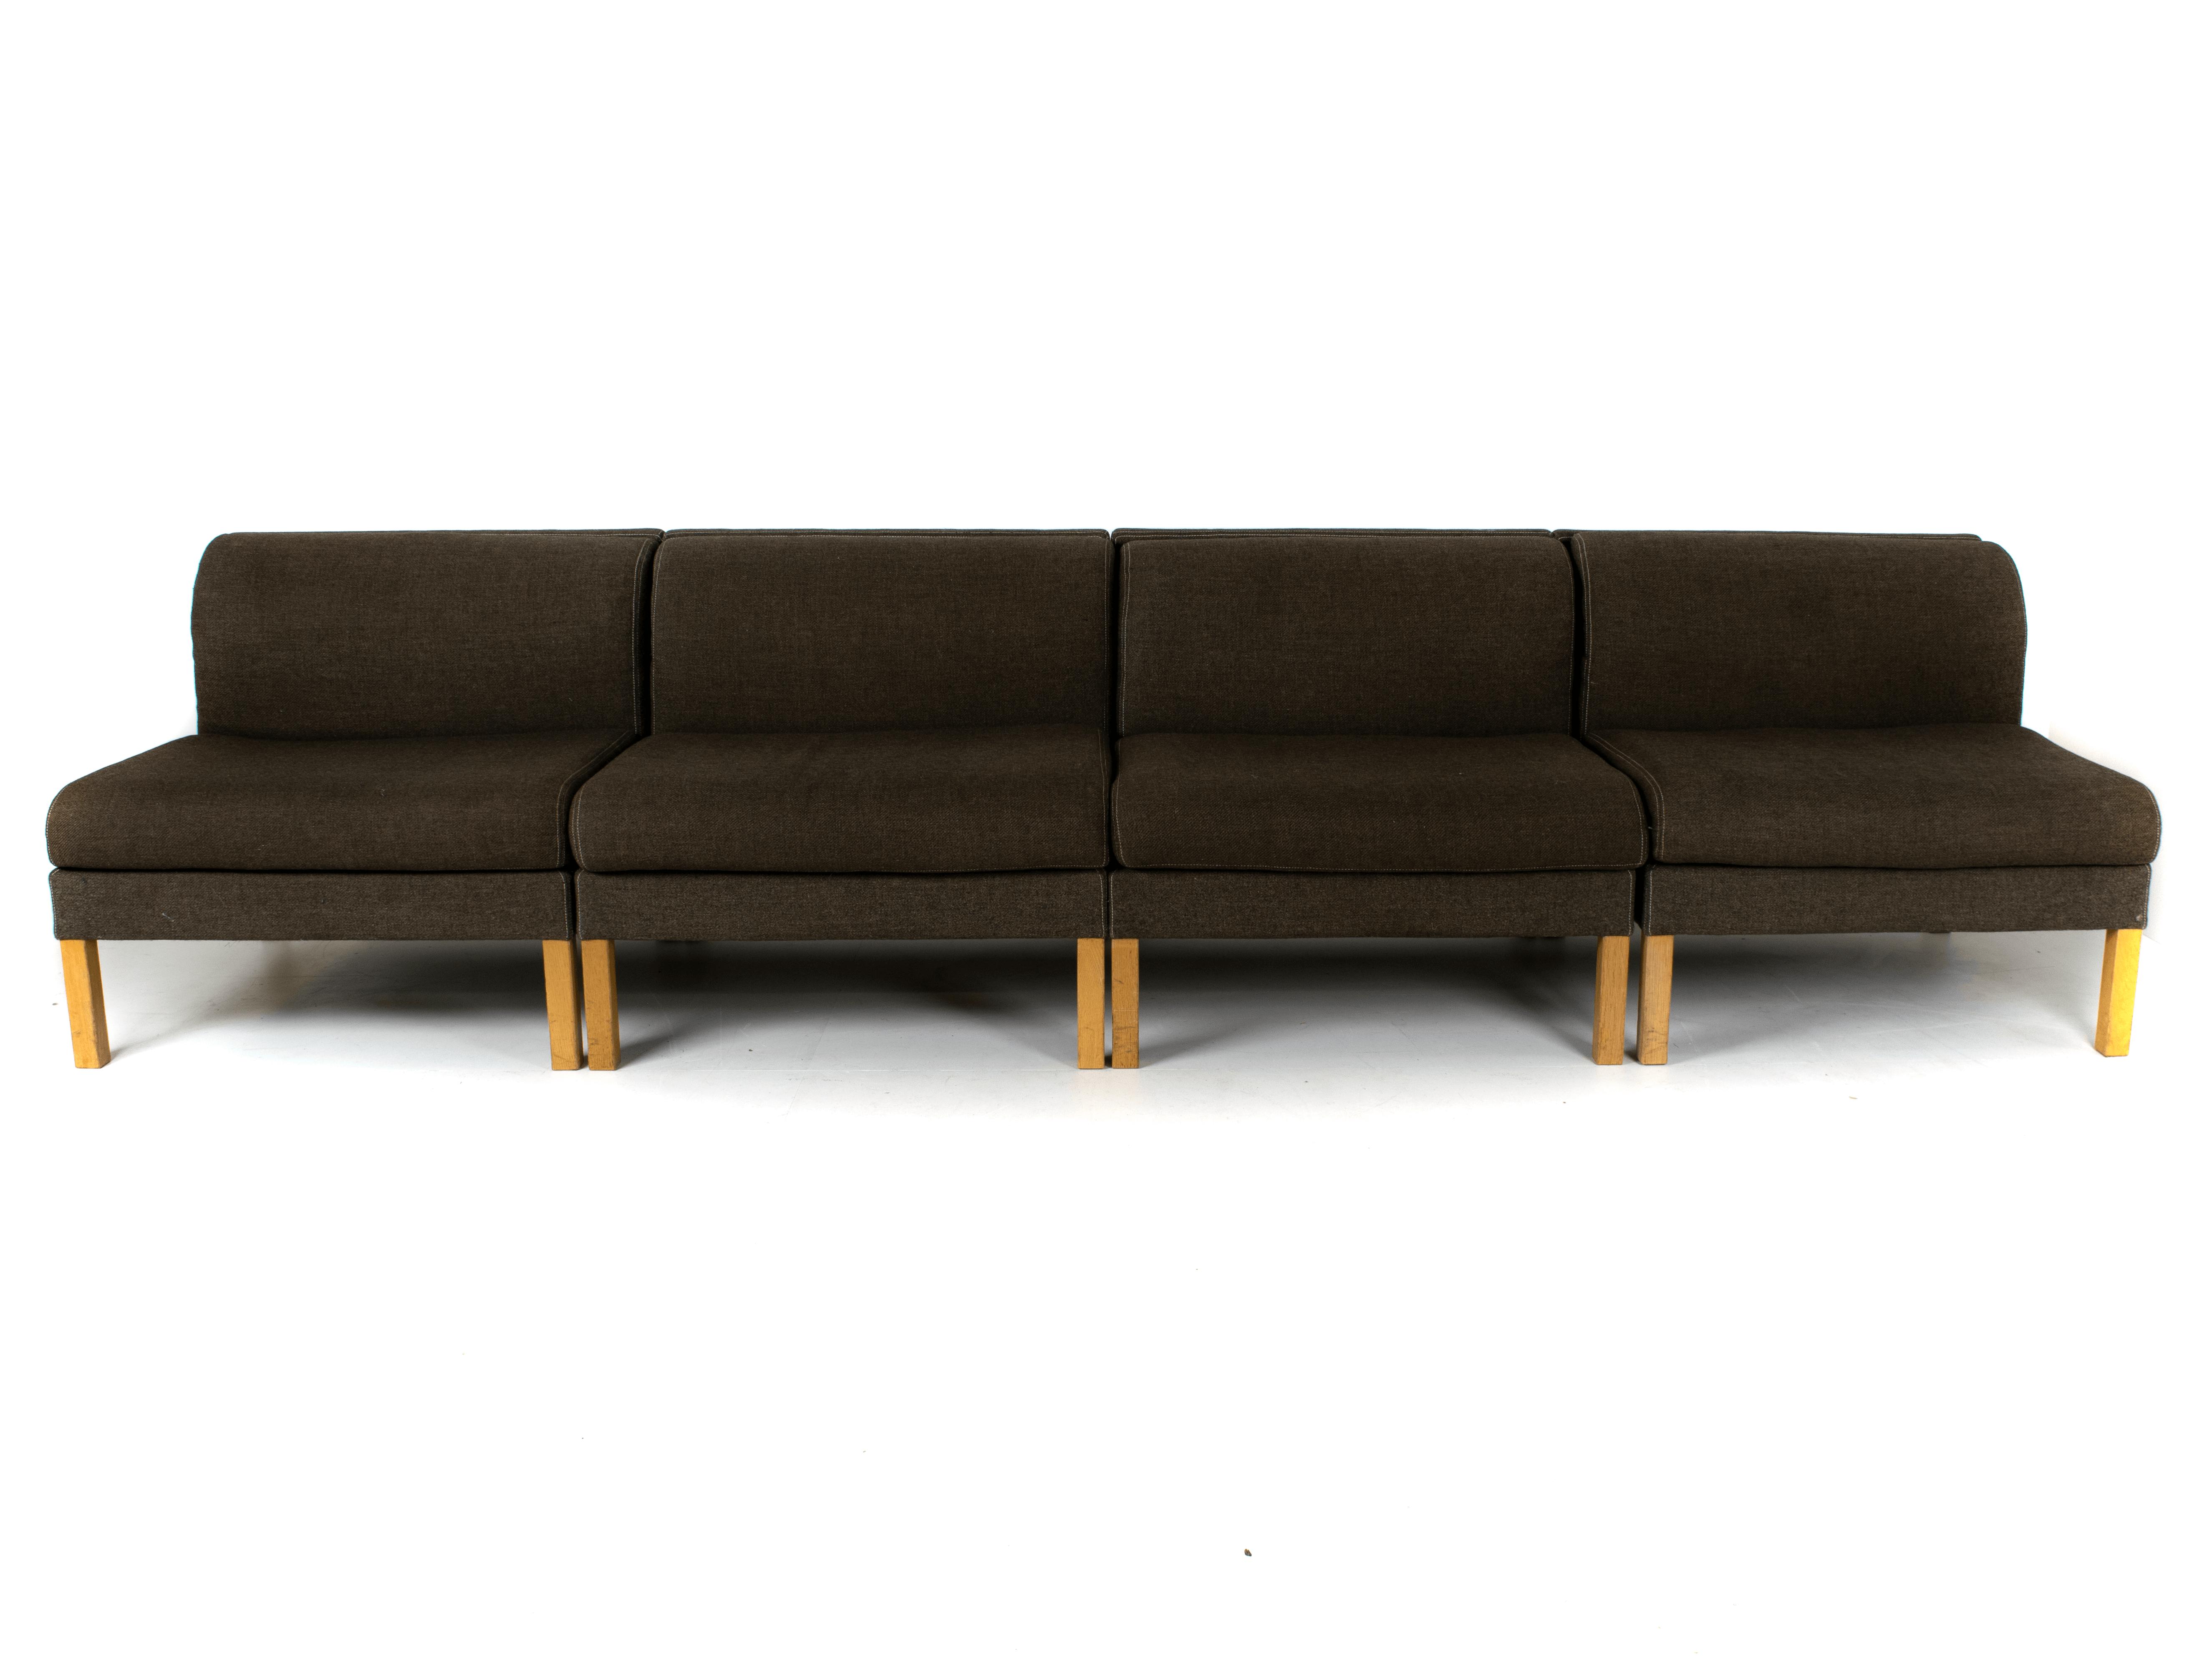 Front view Bernt Petersen Modular Sofa in Oak and Saga 180 Fabric, Denmark 1980